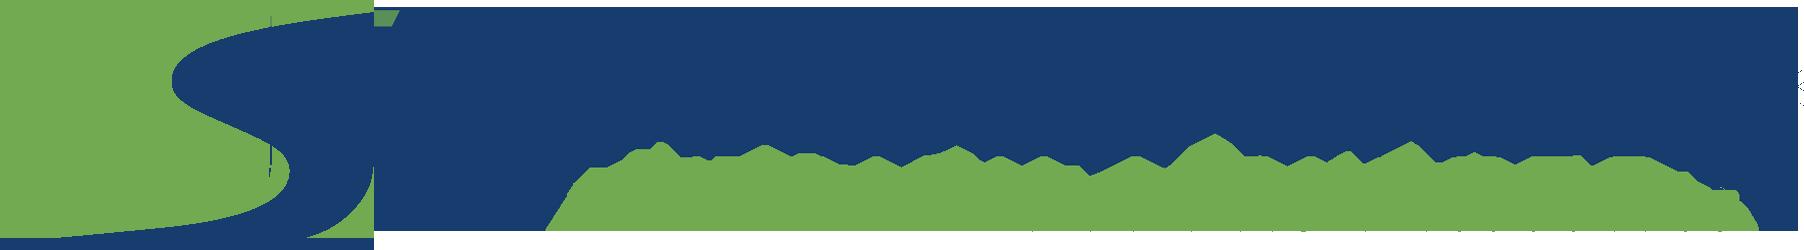 Logo for Shades Creek Wealth Advisors, Inc.